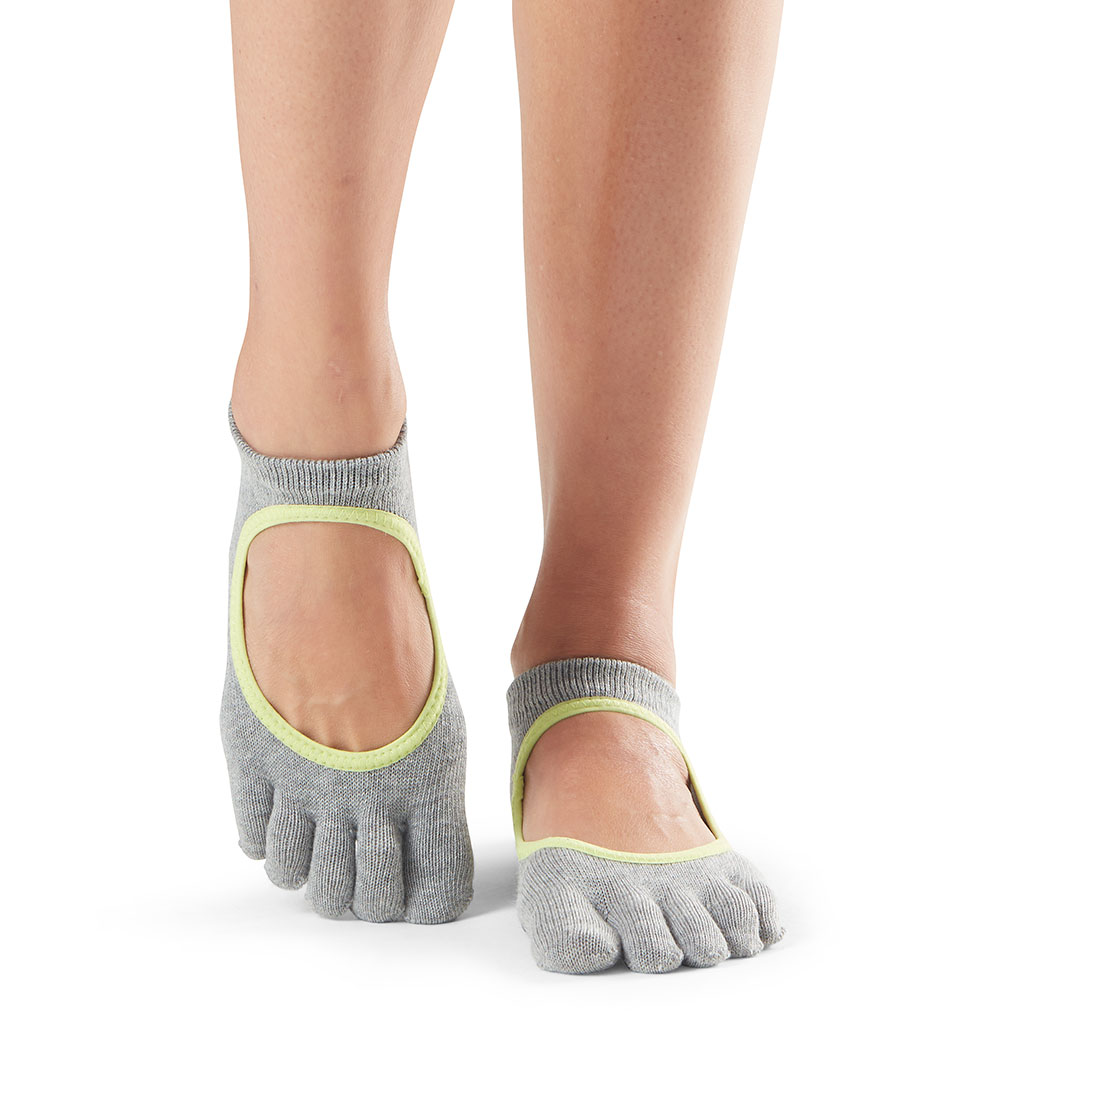 Yogasocken ToeSox Bellarina Full Toe Heather Grey with Lime Trim